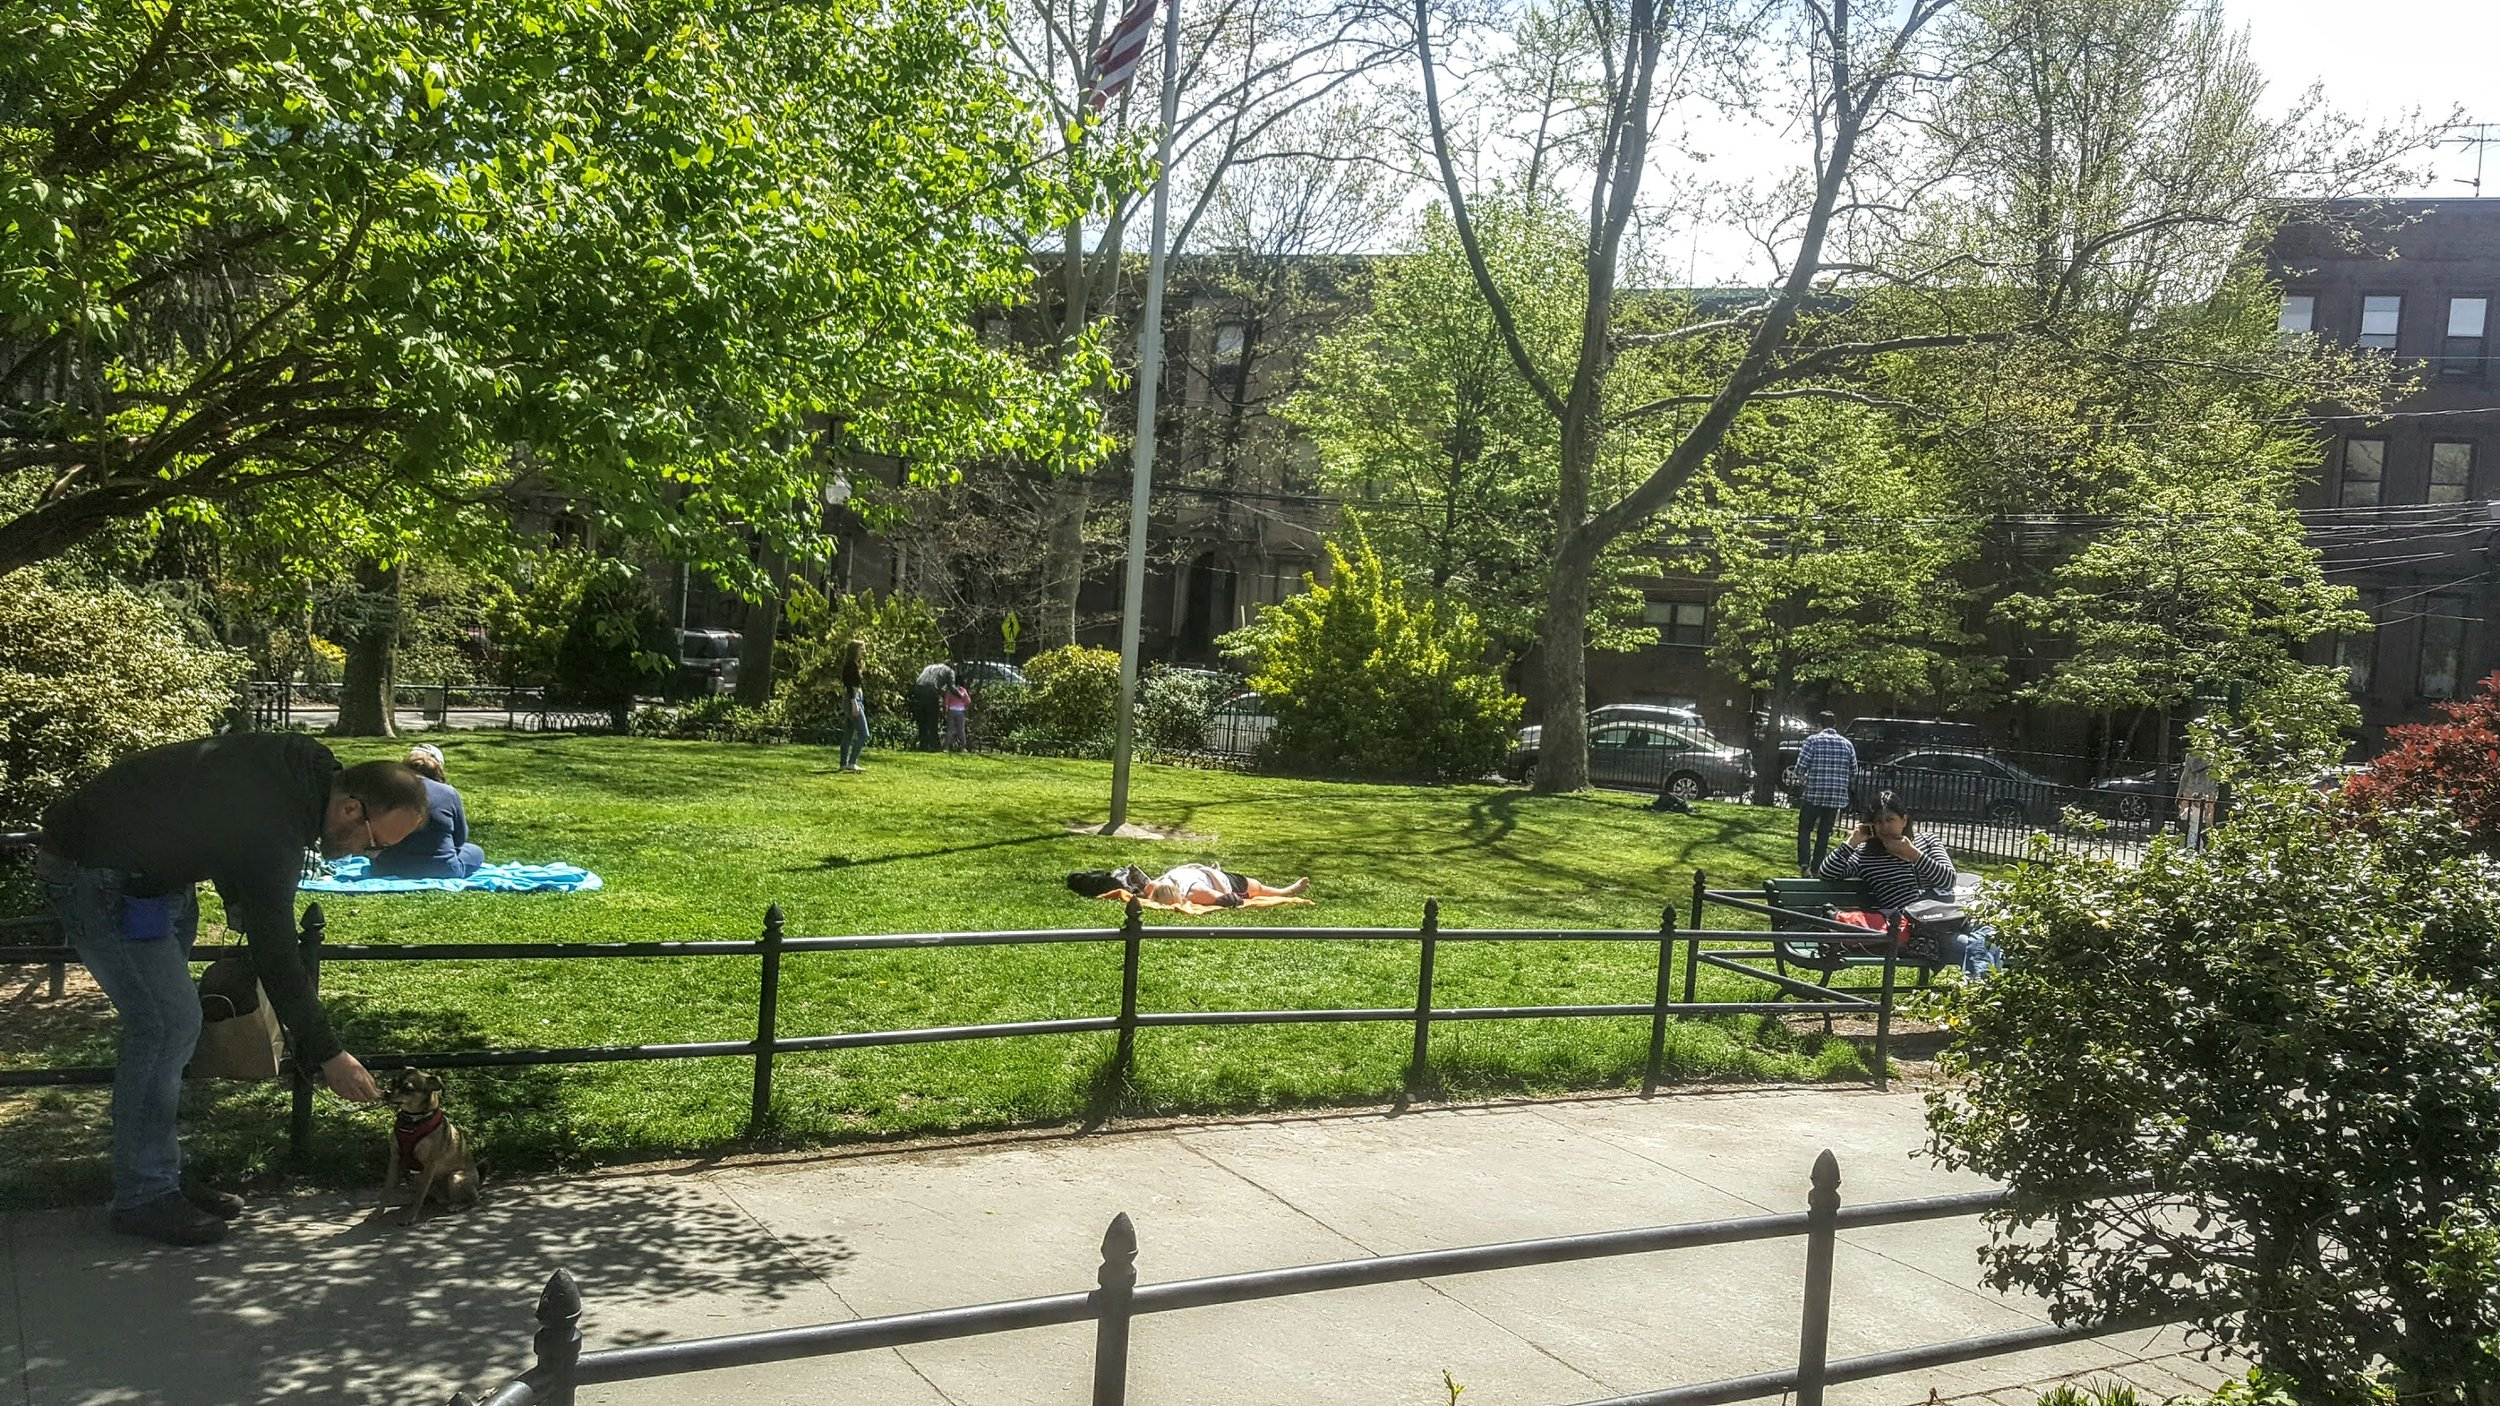 People enjoying the lawned area of Van Vorst Park.